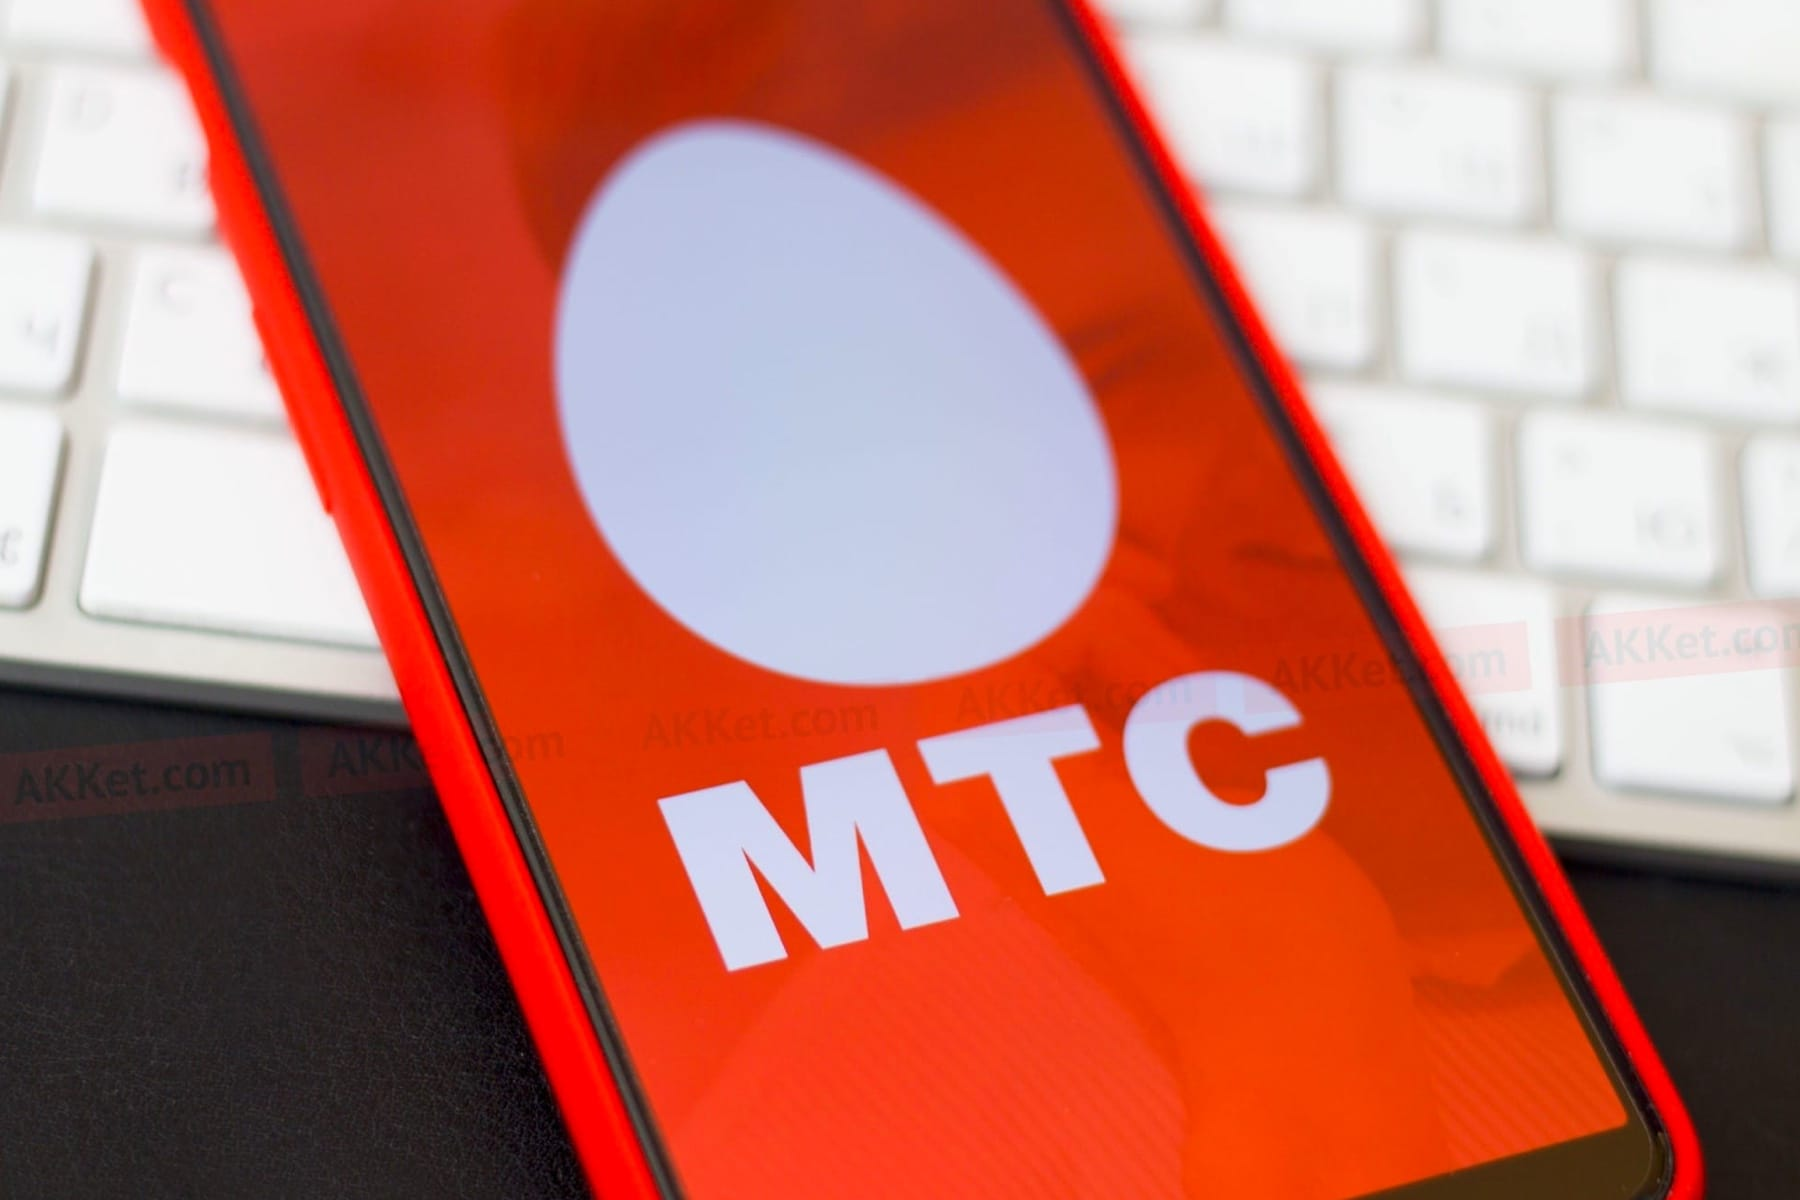 MTS-Rossiya-Besplatno-Operator-52-1.jpg